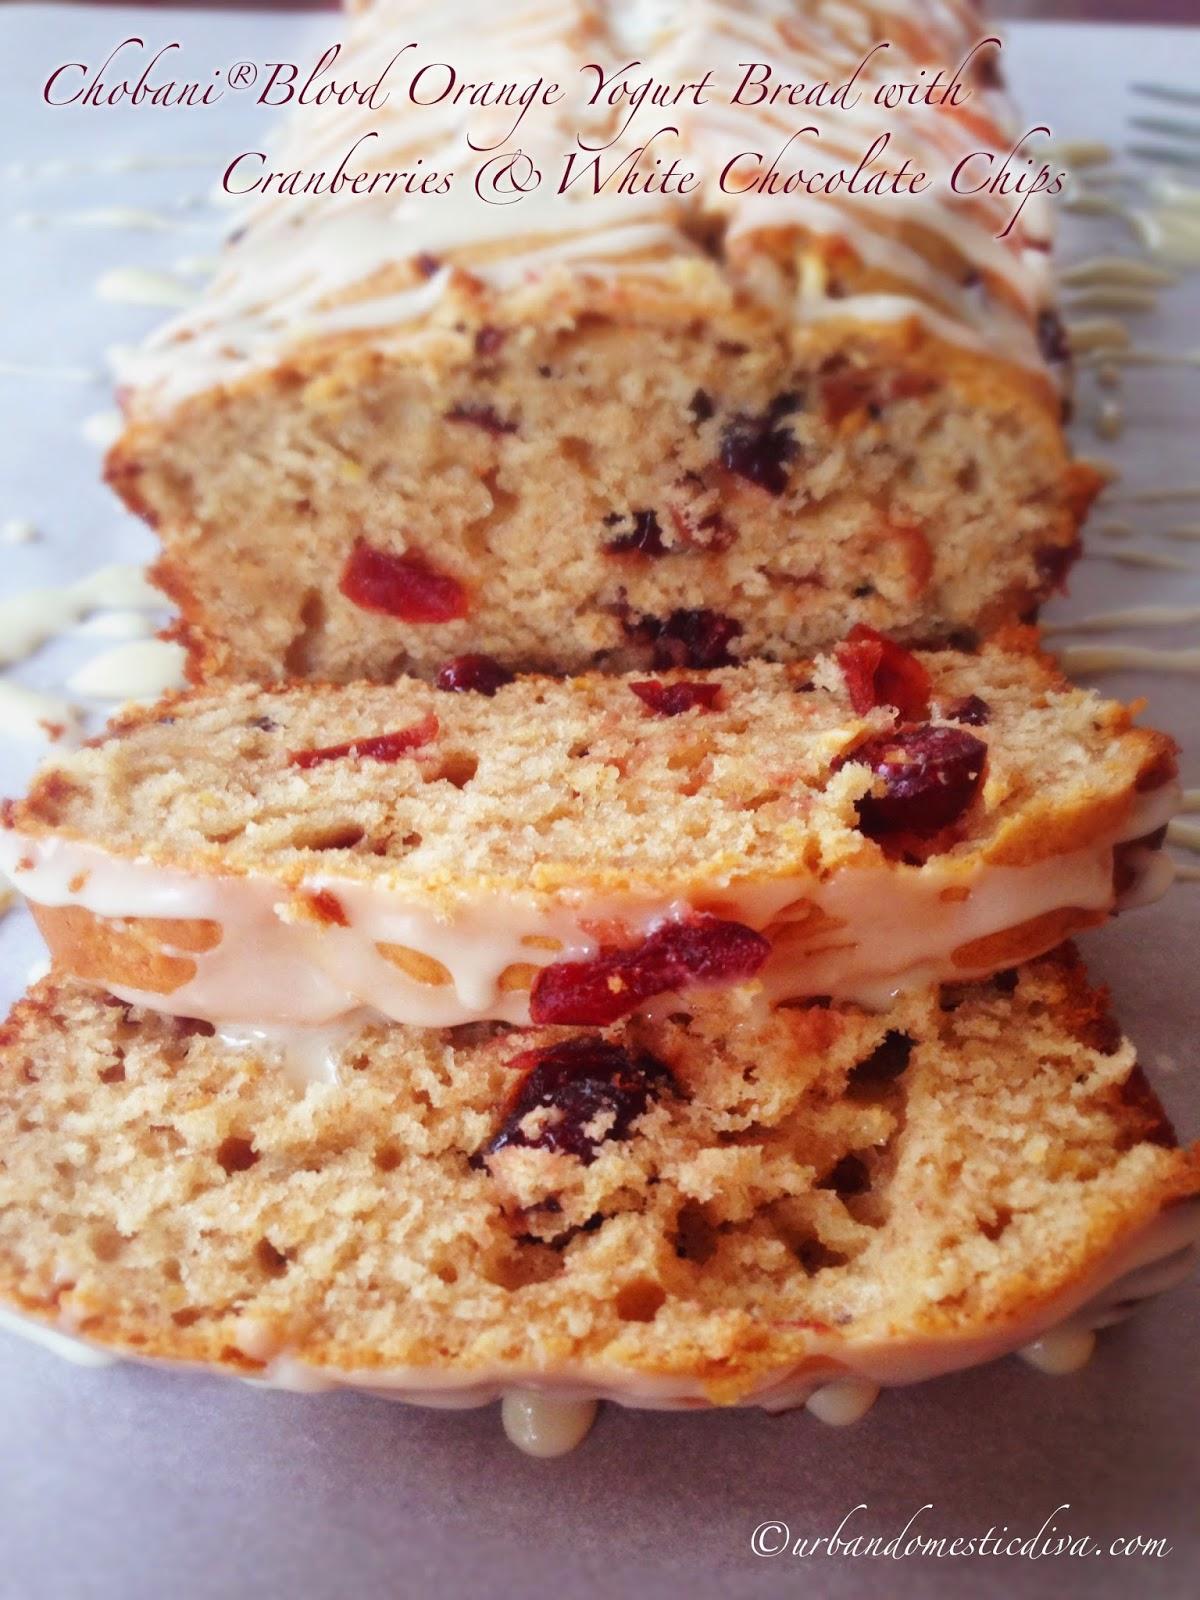 RECIPE: Chobani® Blood Orange Yogurt Bread with Cranberries and White ...